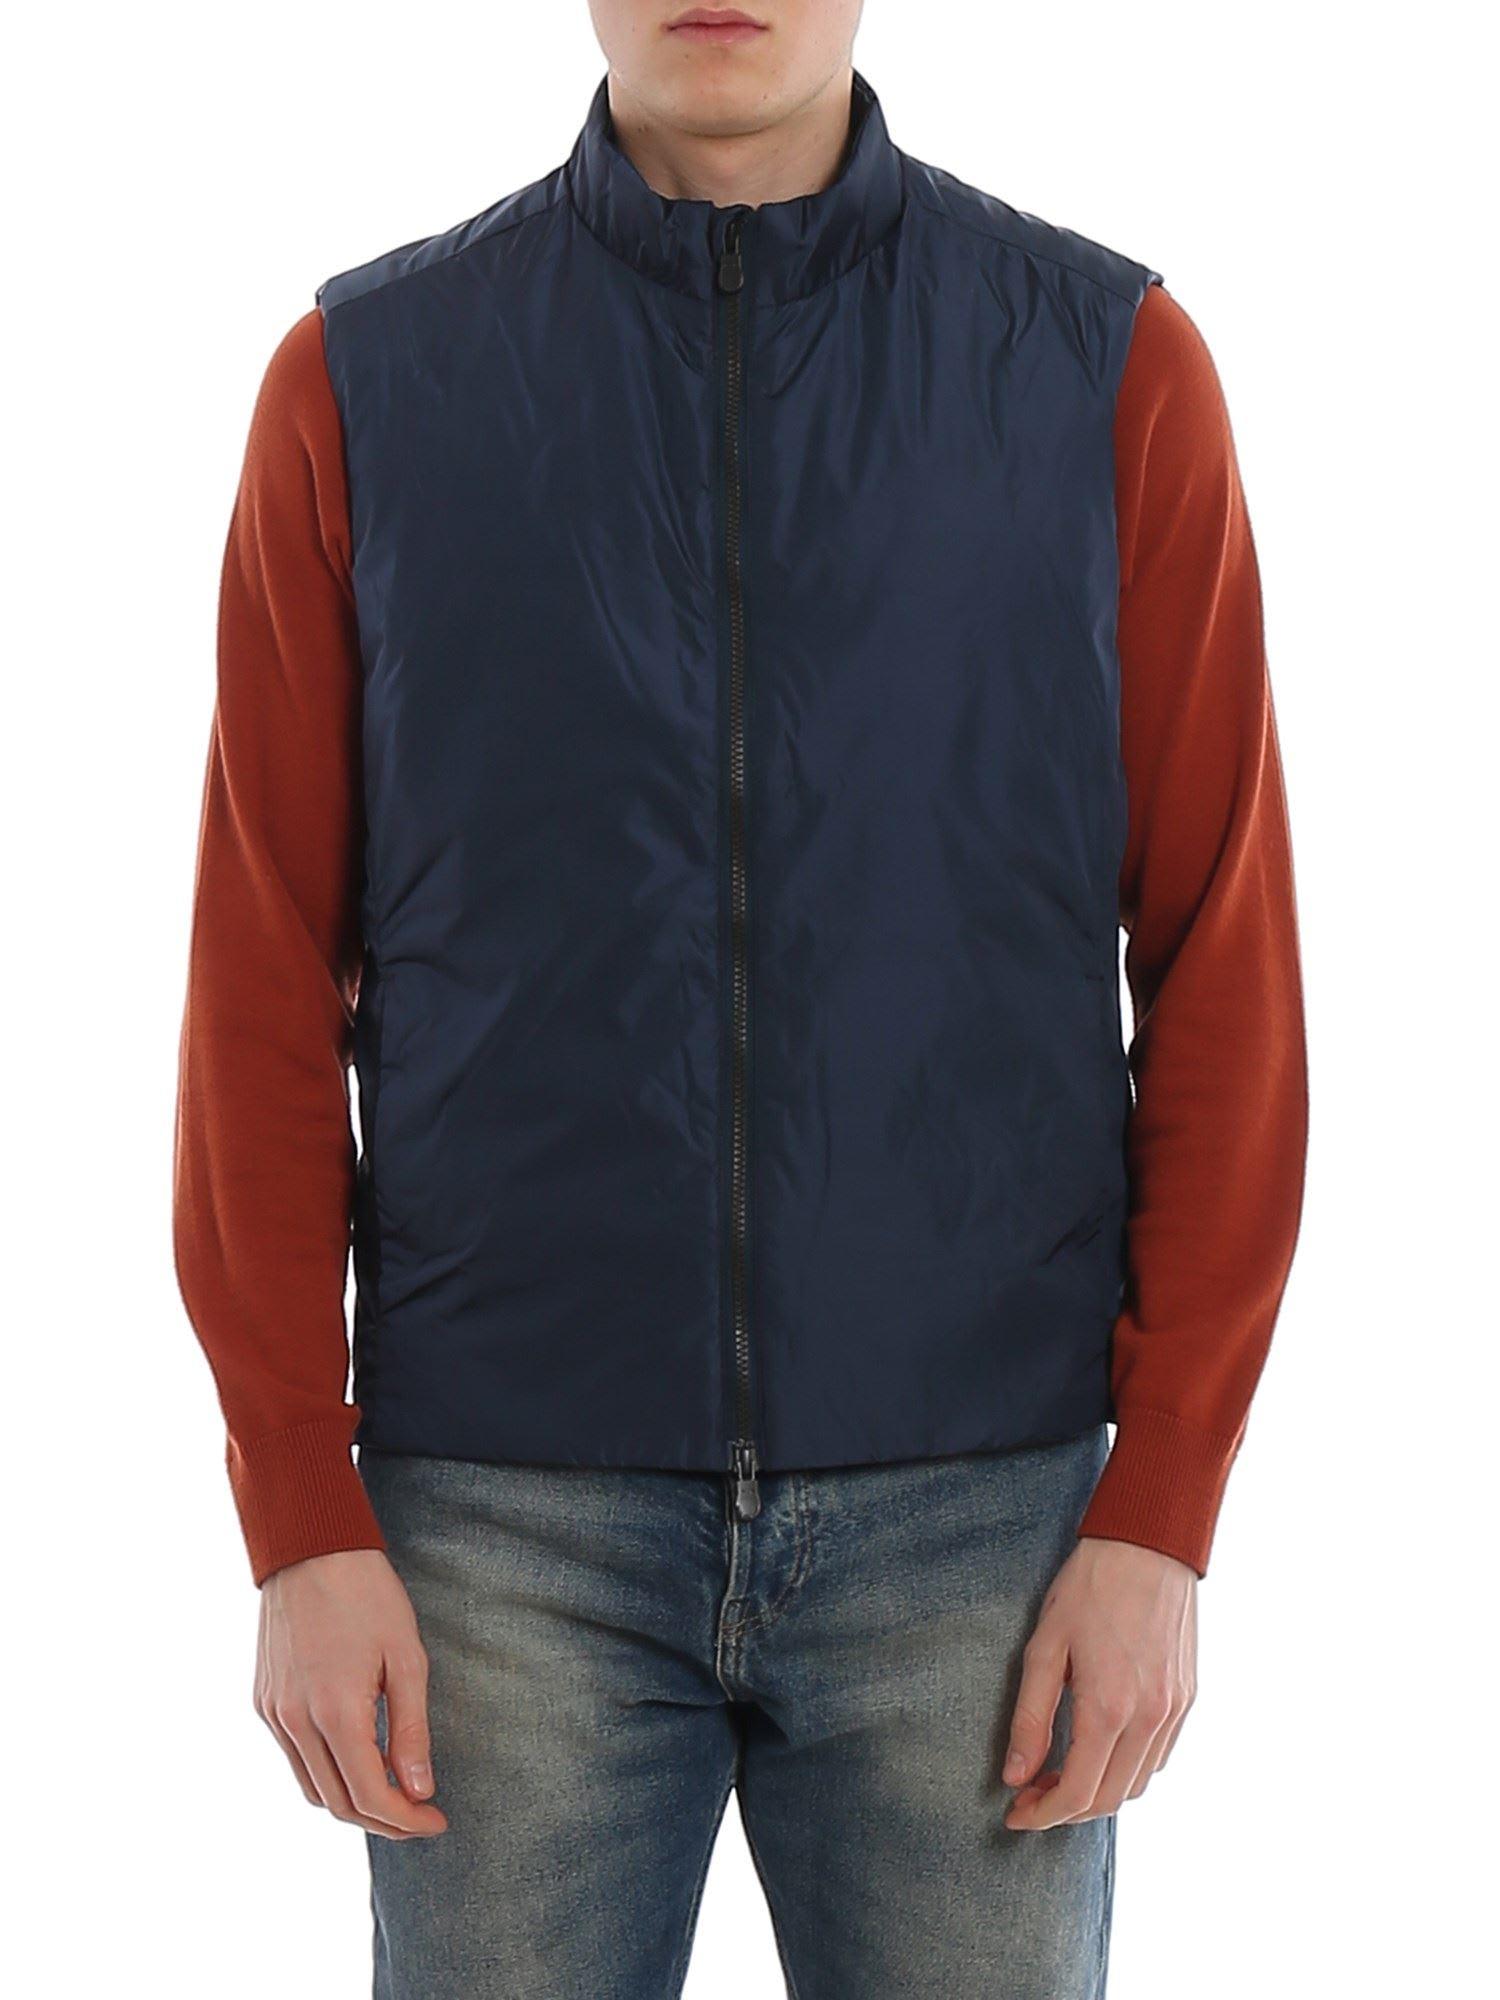 Water Resistant Padded Waistcoat